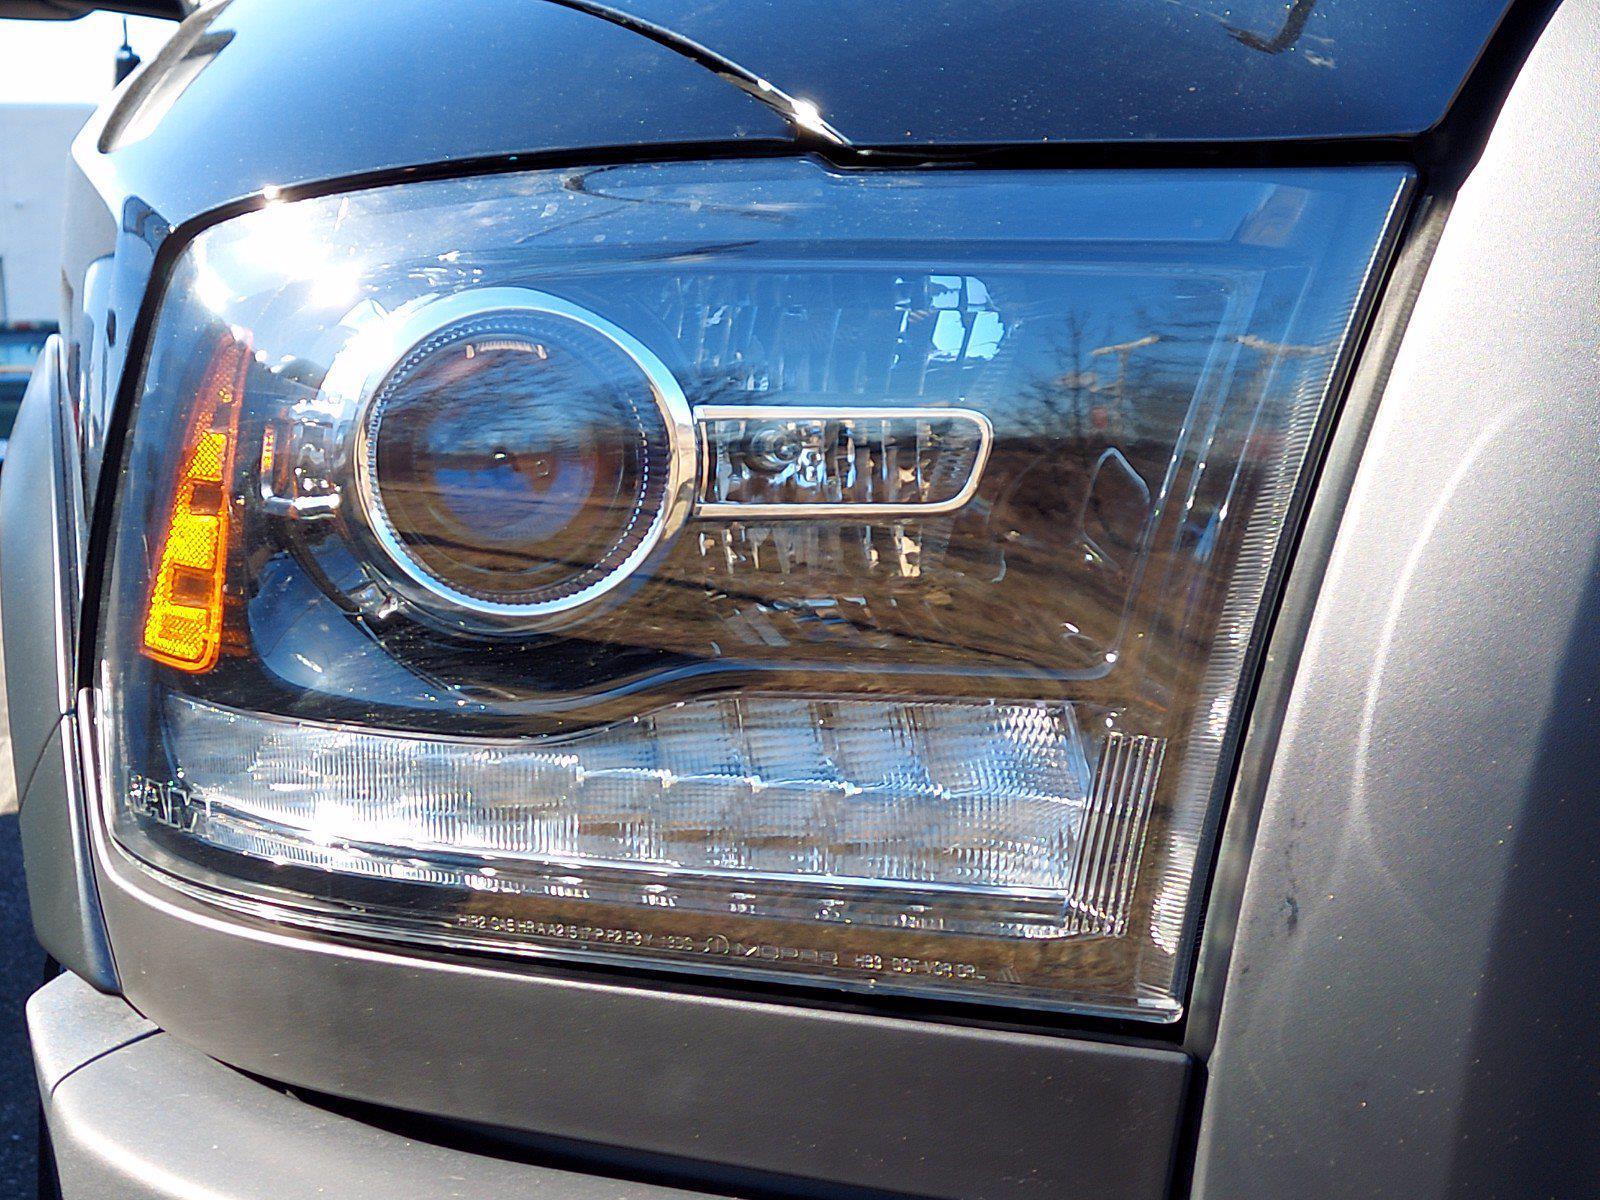 2021 Ram 1500 Quad Cab 4x4, Pickup #CM143 - photo 5